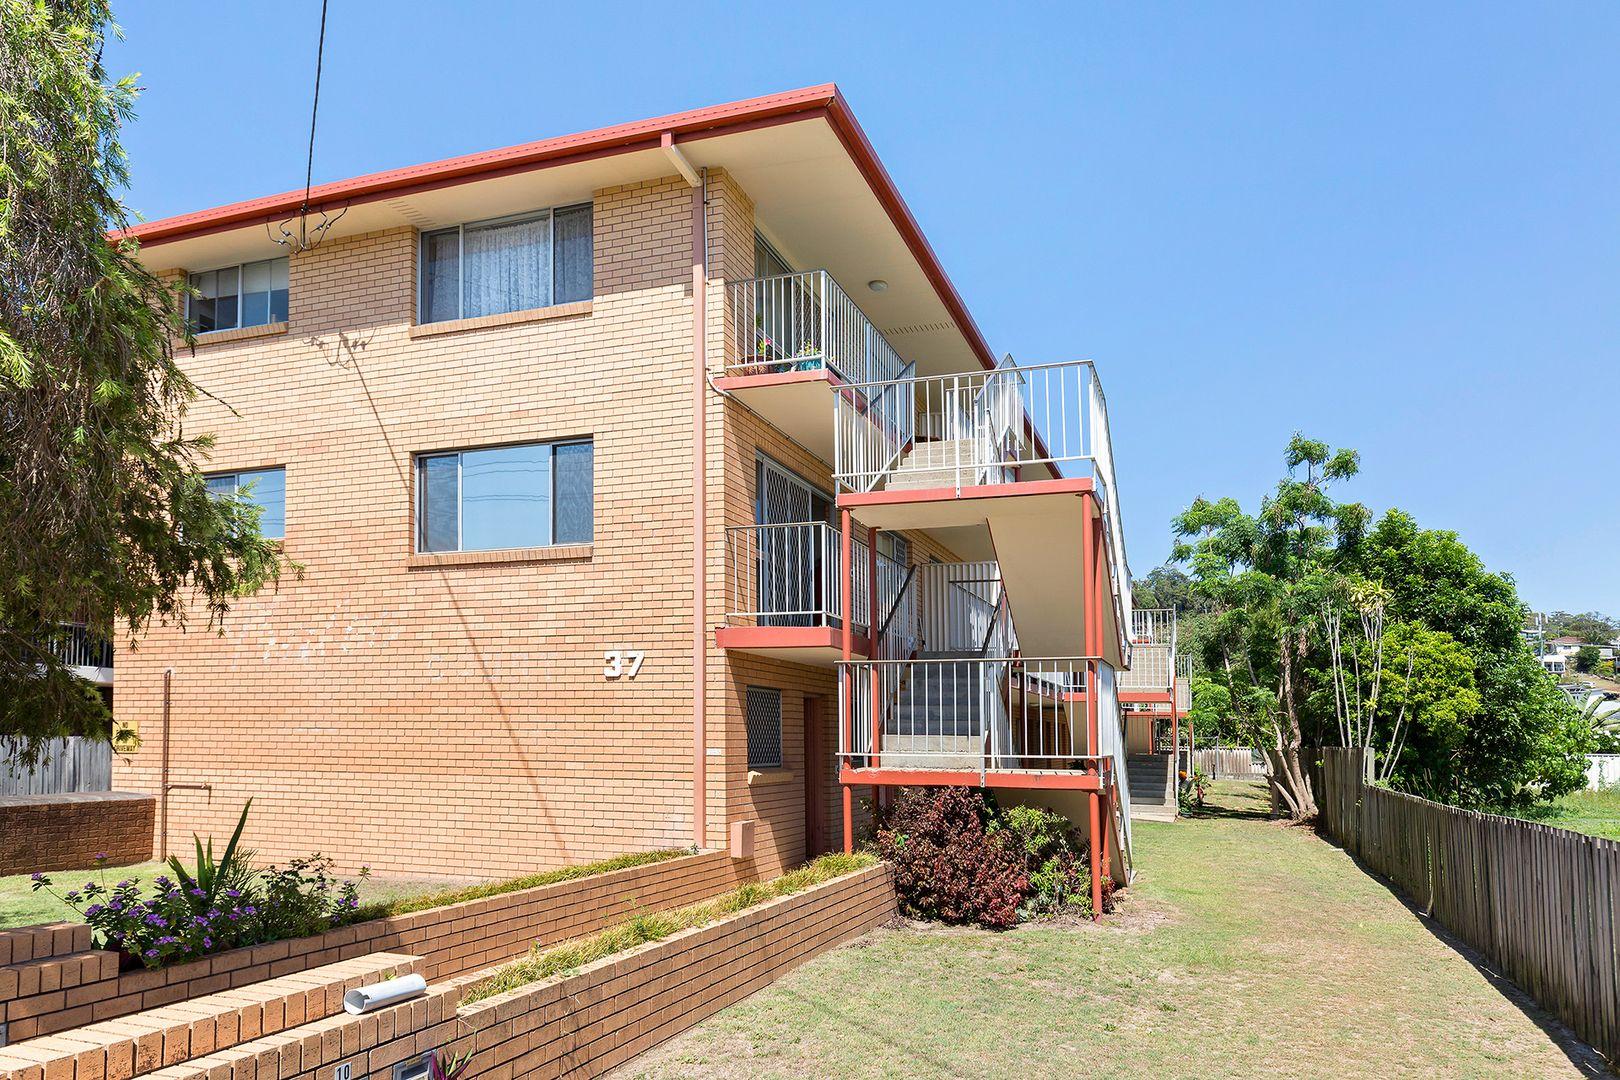 2/37 Boyd Street, Tweed Heads NSW 2485, Image 1